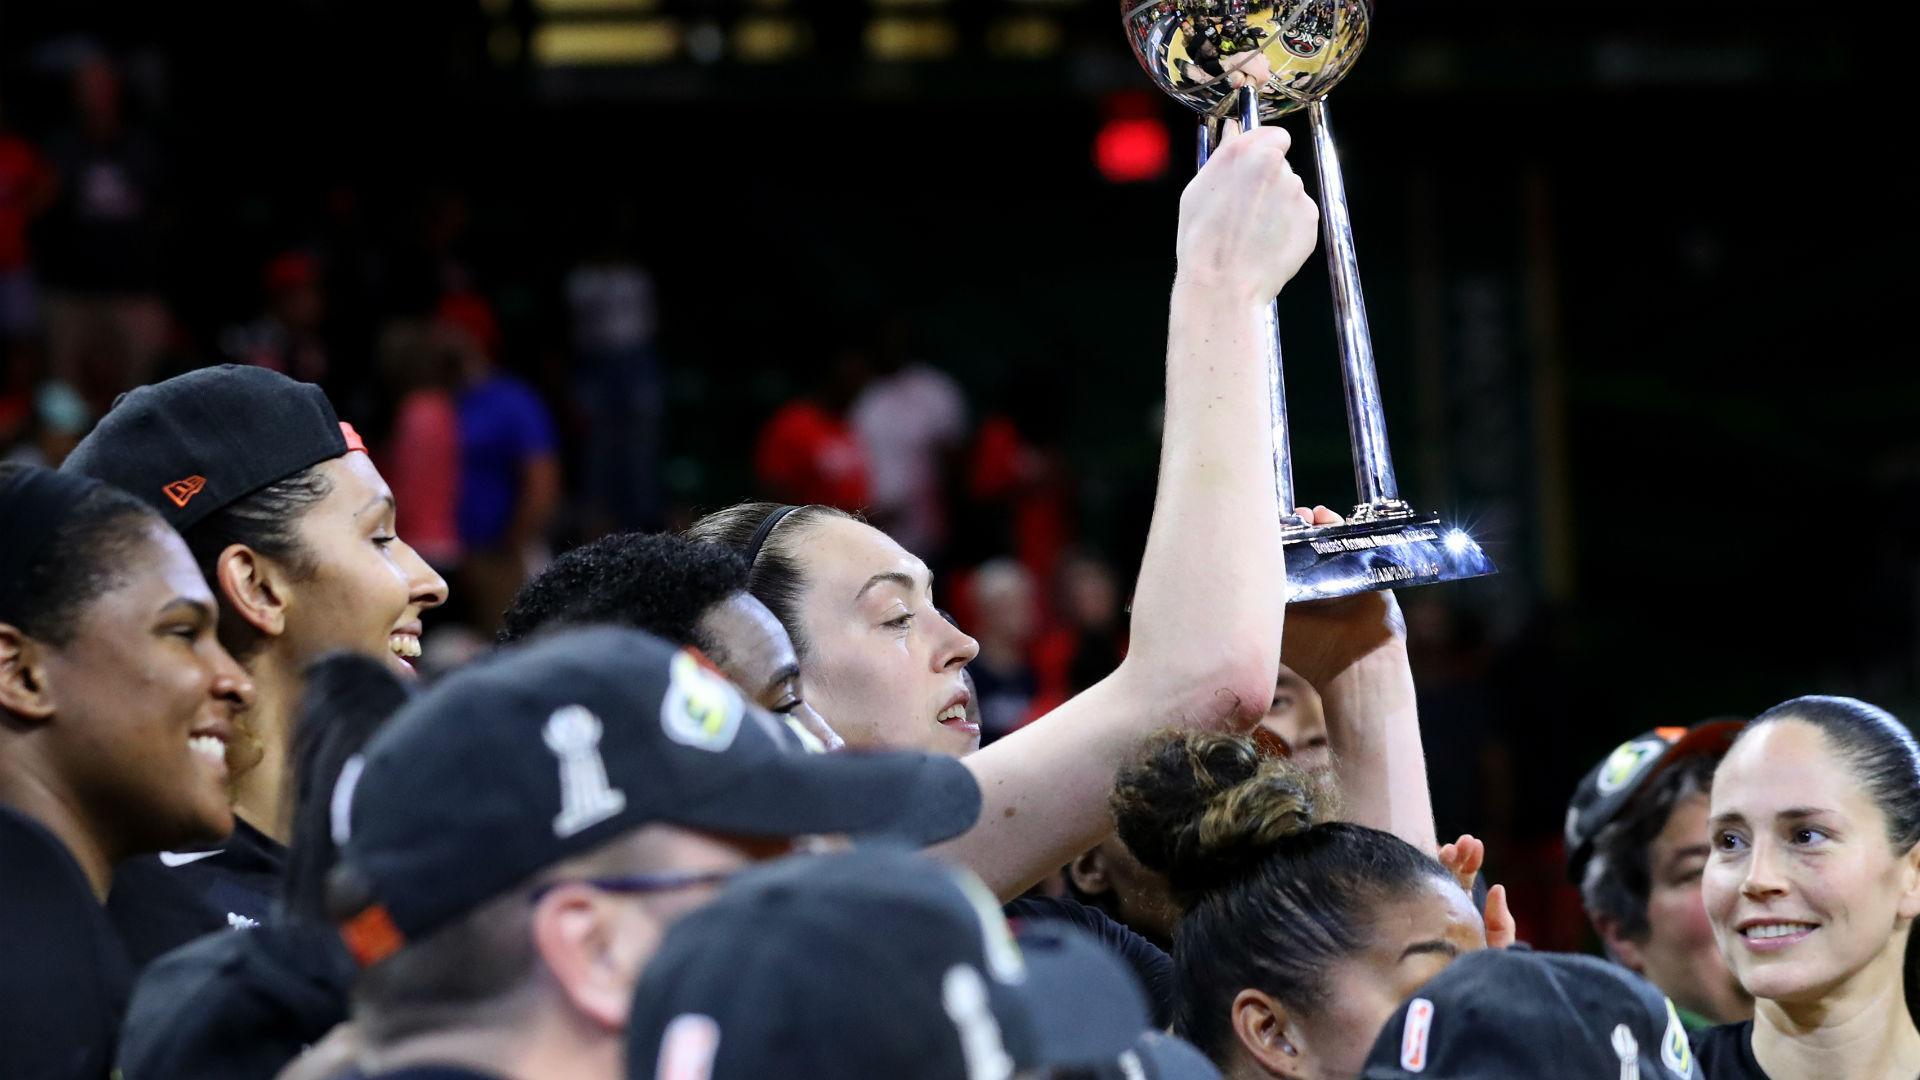 WNBA 2019: 5 storylines to follow this season